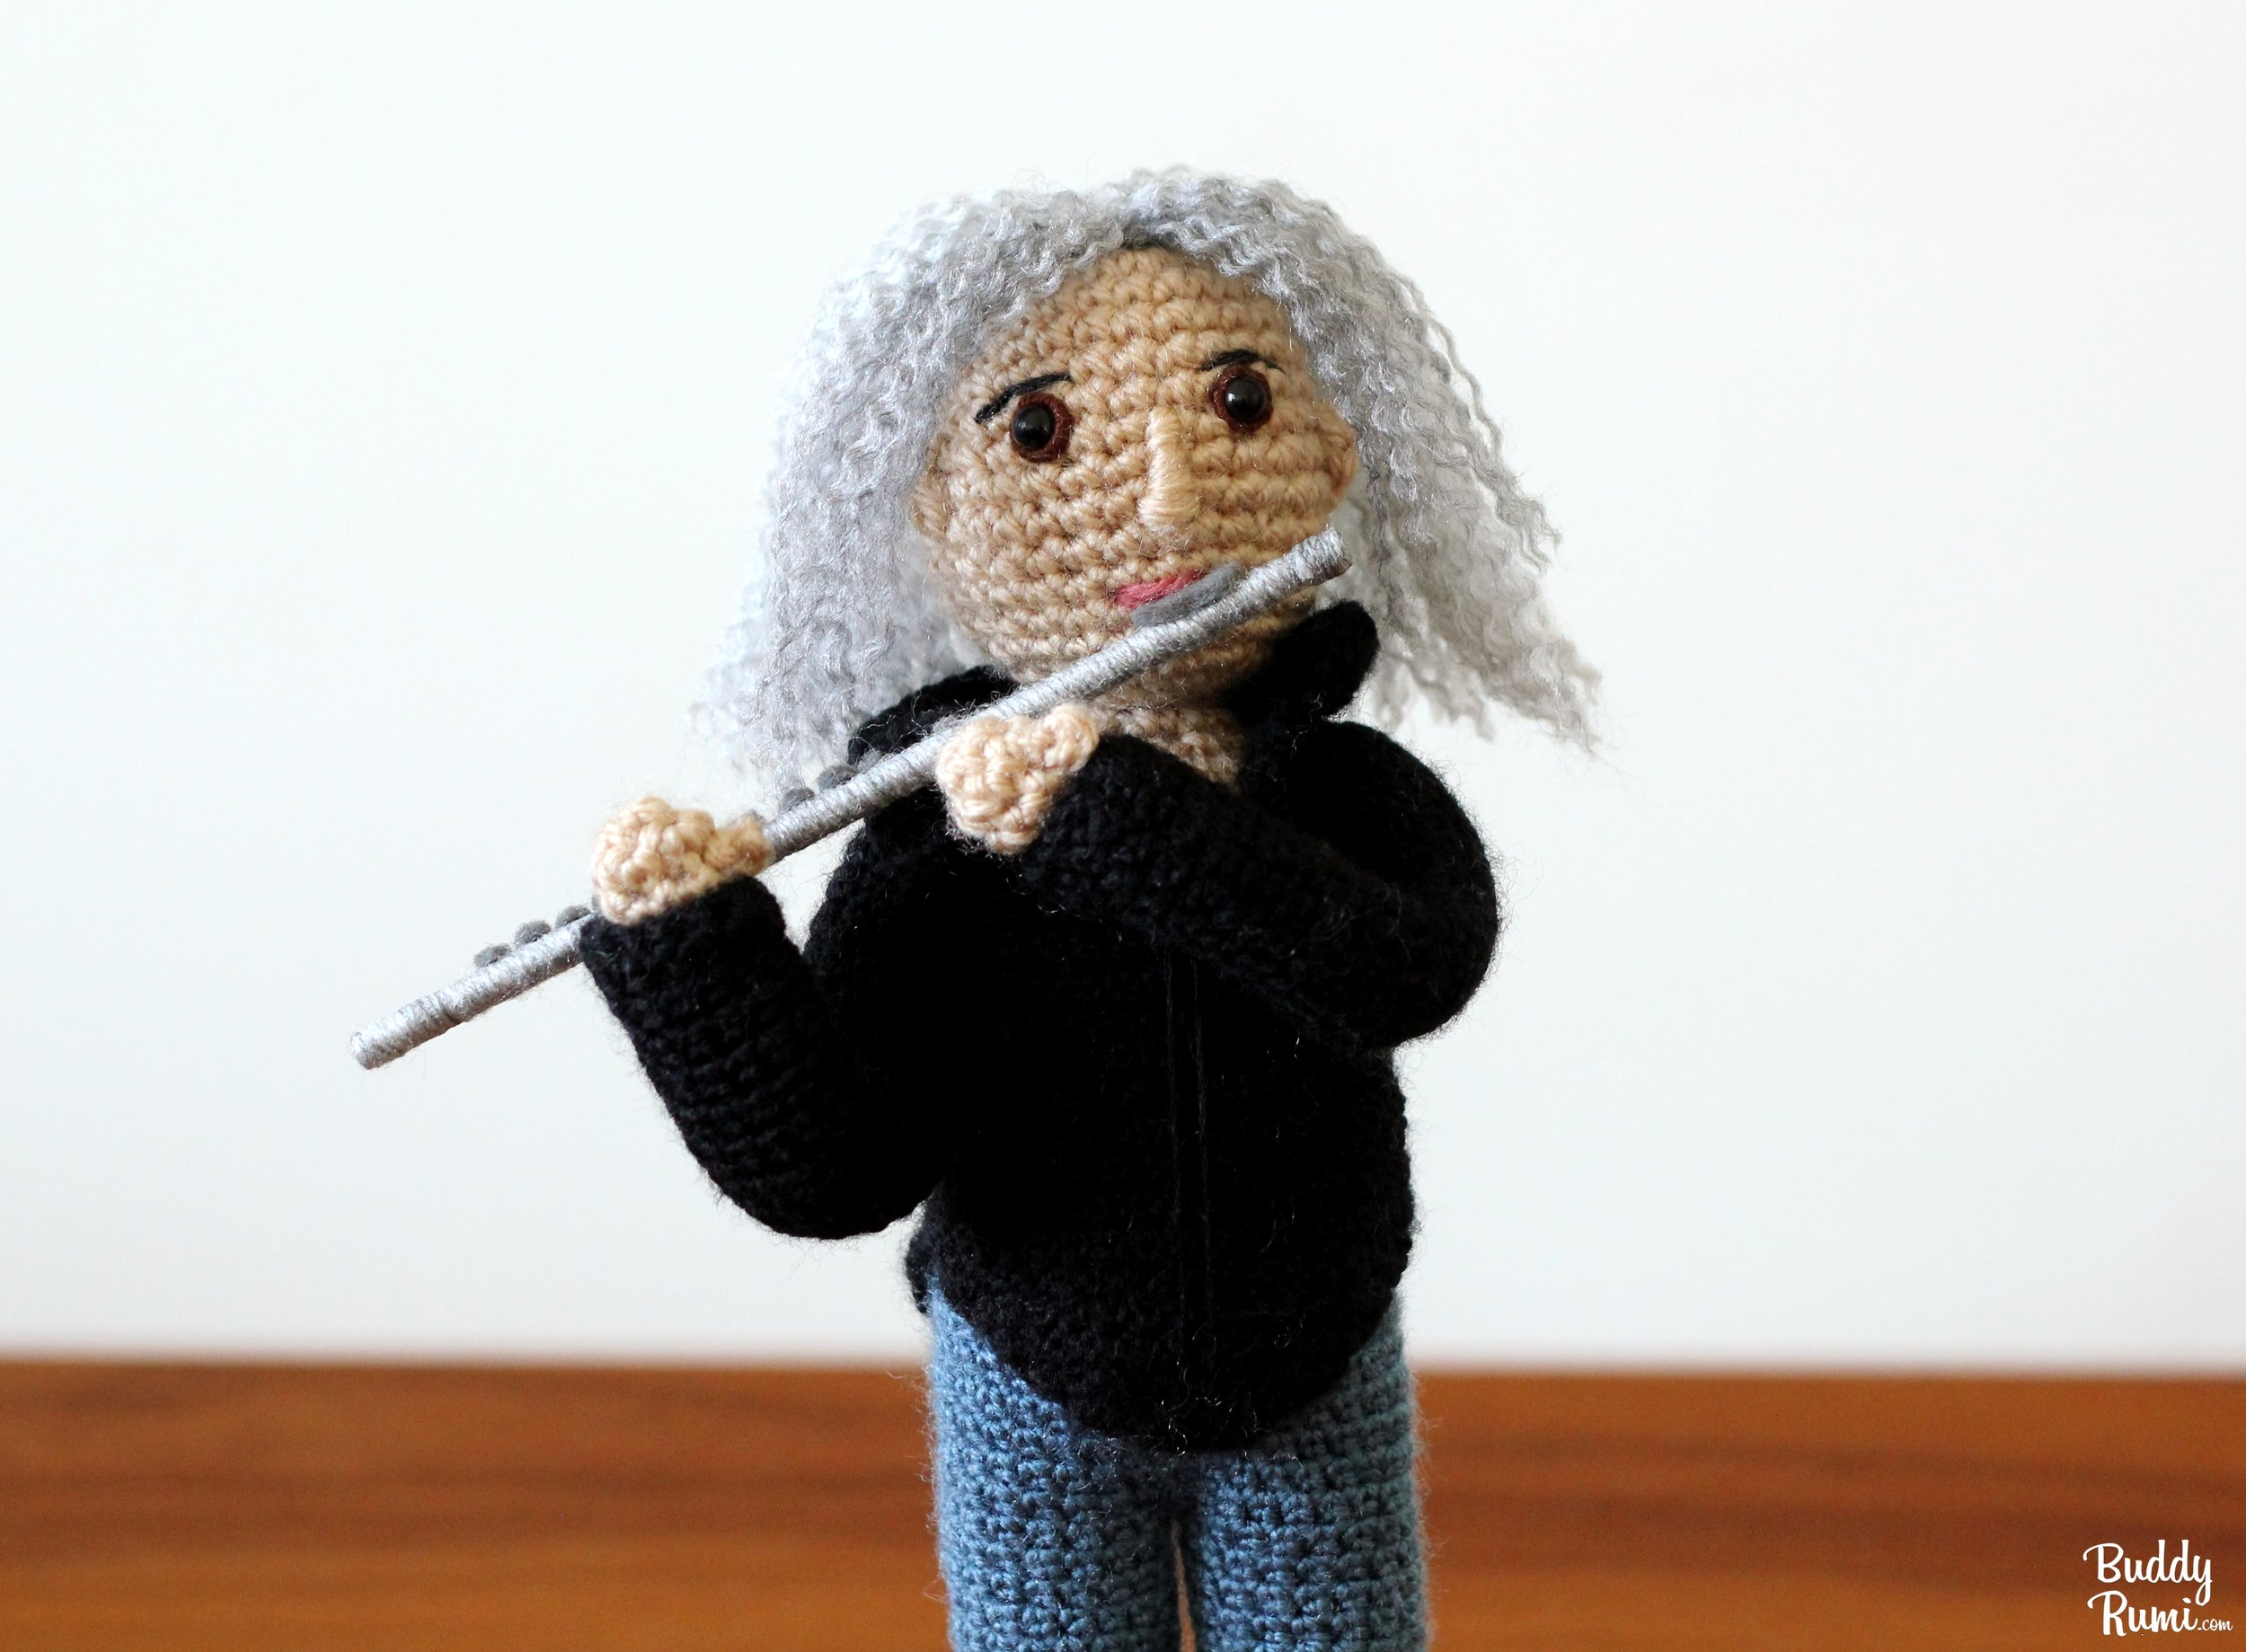 Crochet flute player